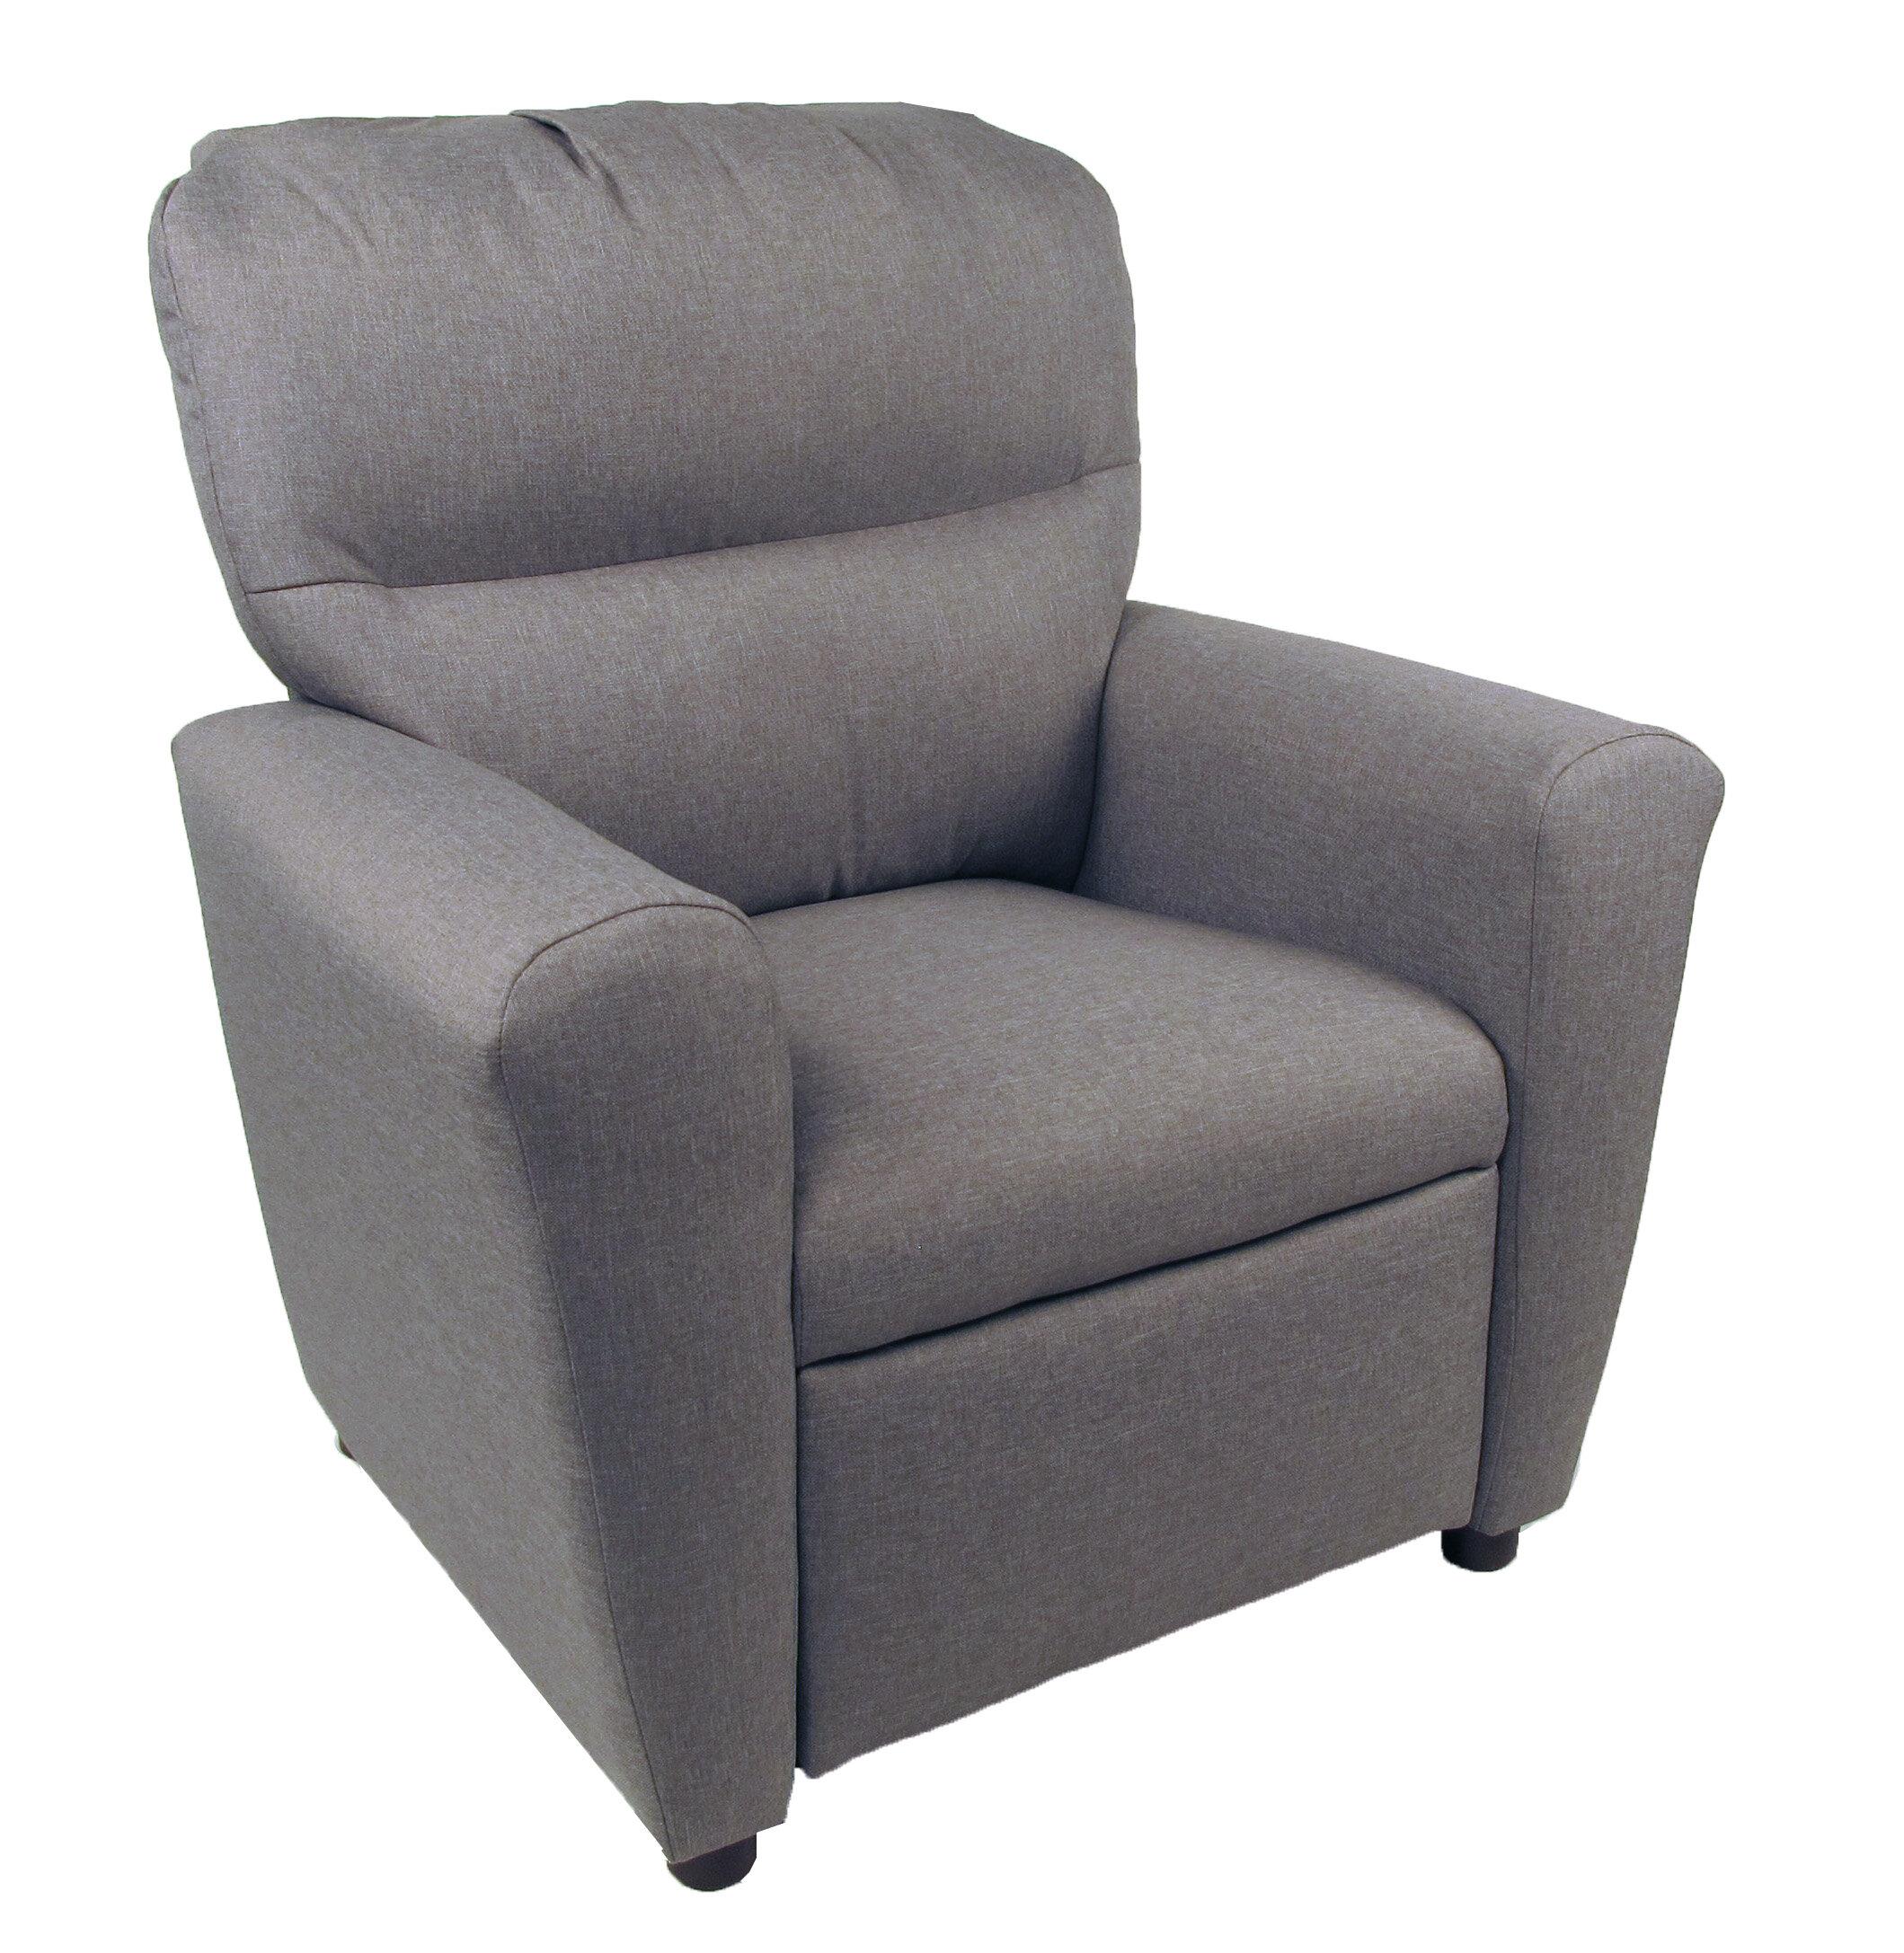 Phenomenal Eastbourne Kids Chair Inzonedesignstudio Interior Chair Design Inzonedesignstudiocom